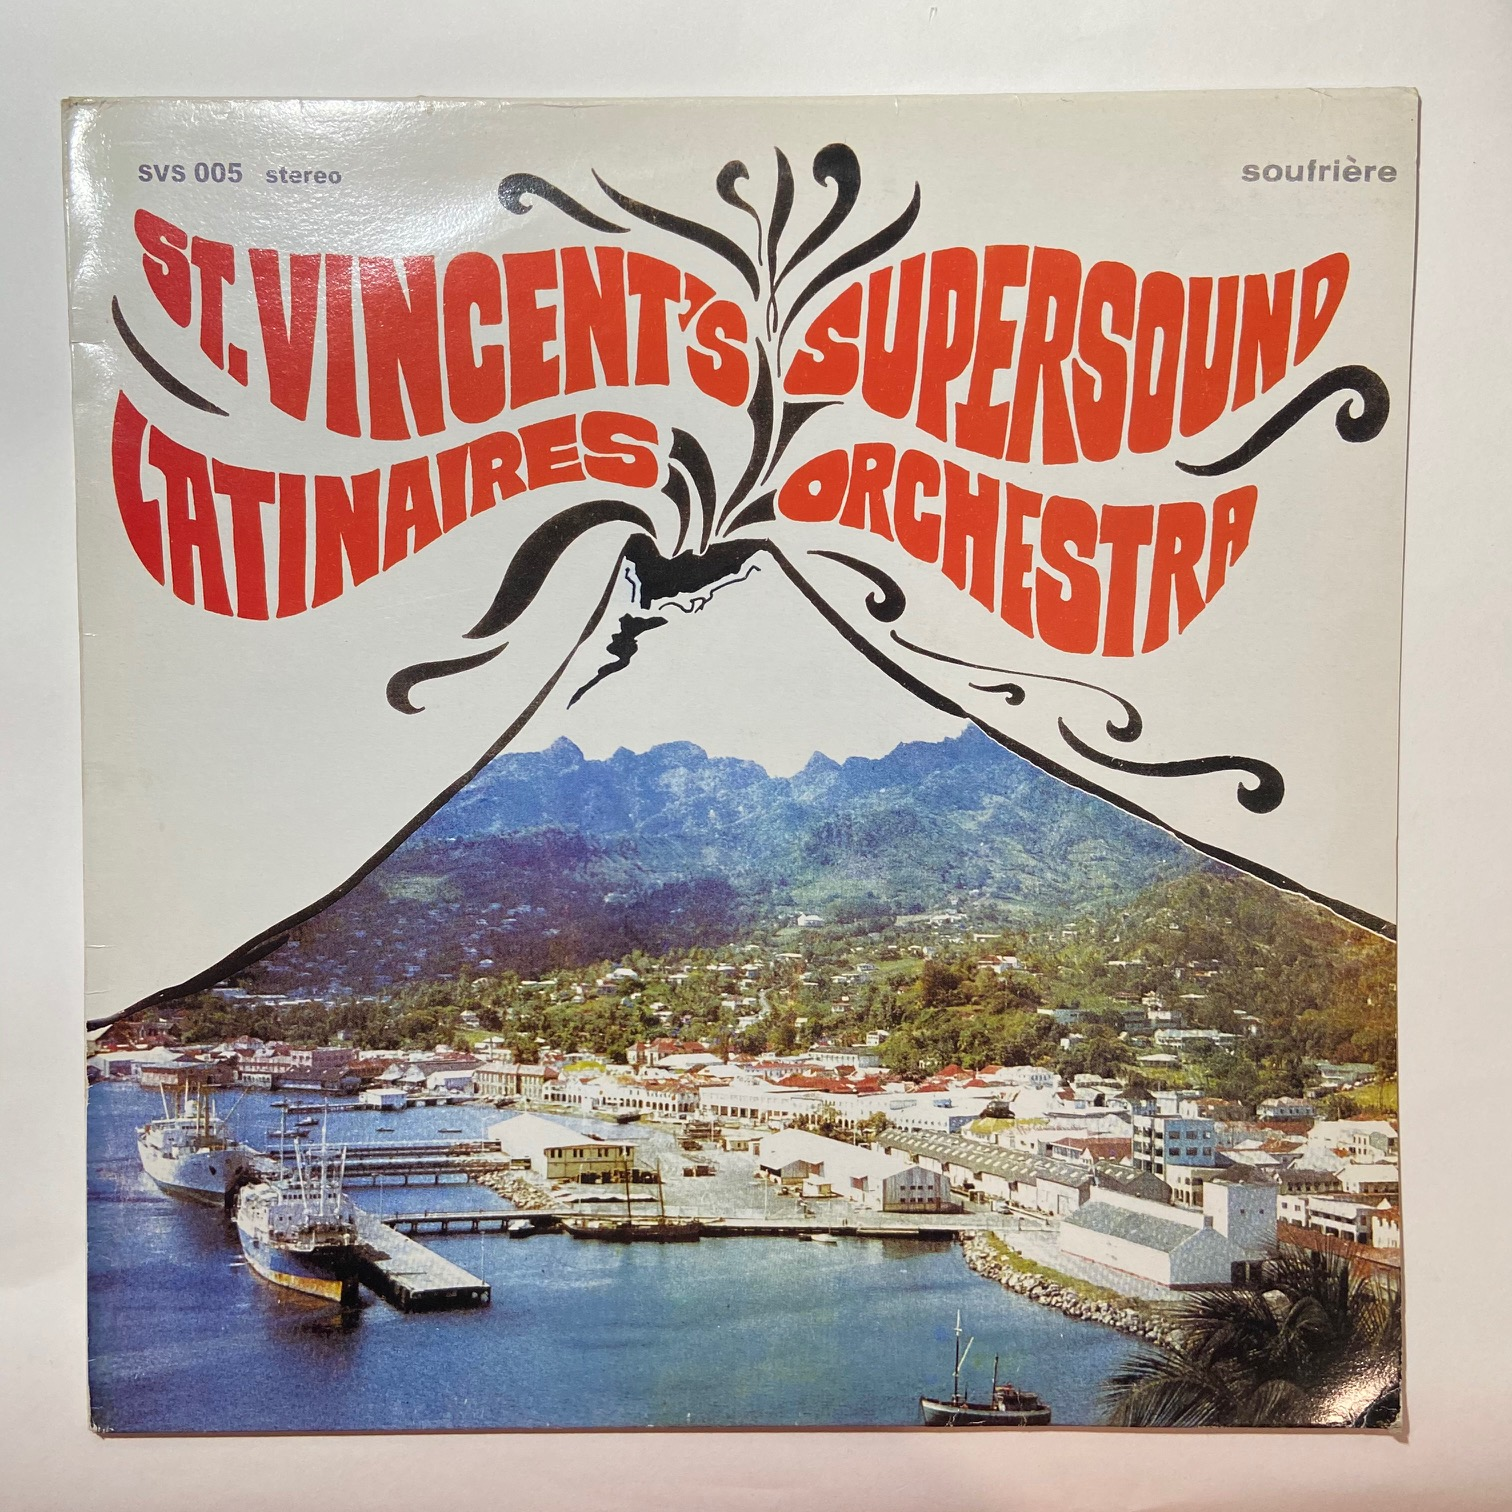 ST. VINCENT'S SUPERSOUND LATINAIRES ORCHESTRA - Same - LP